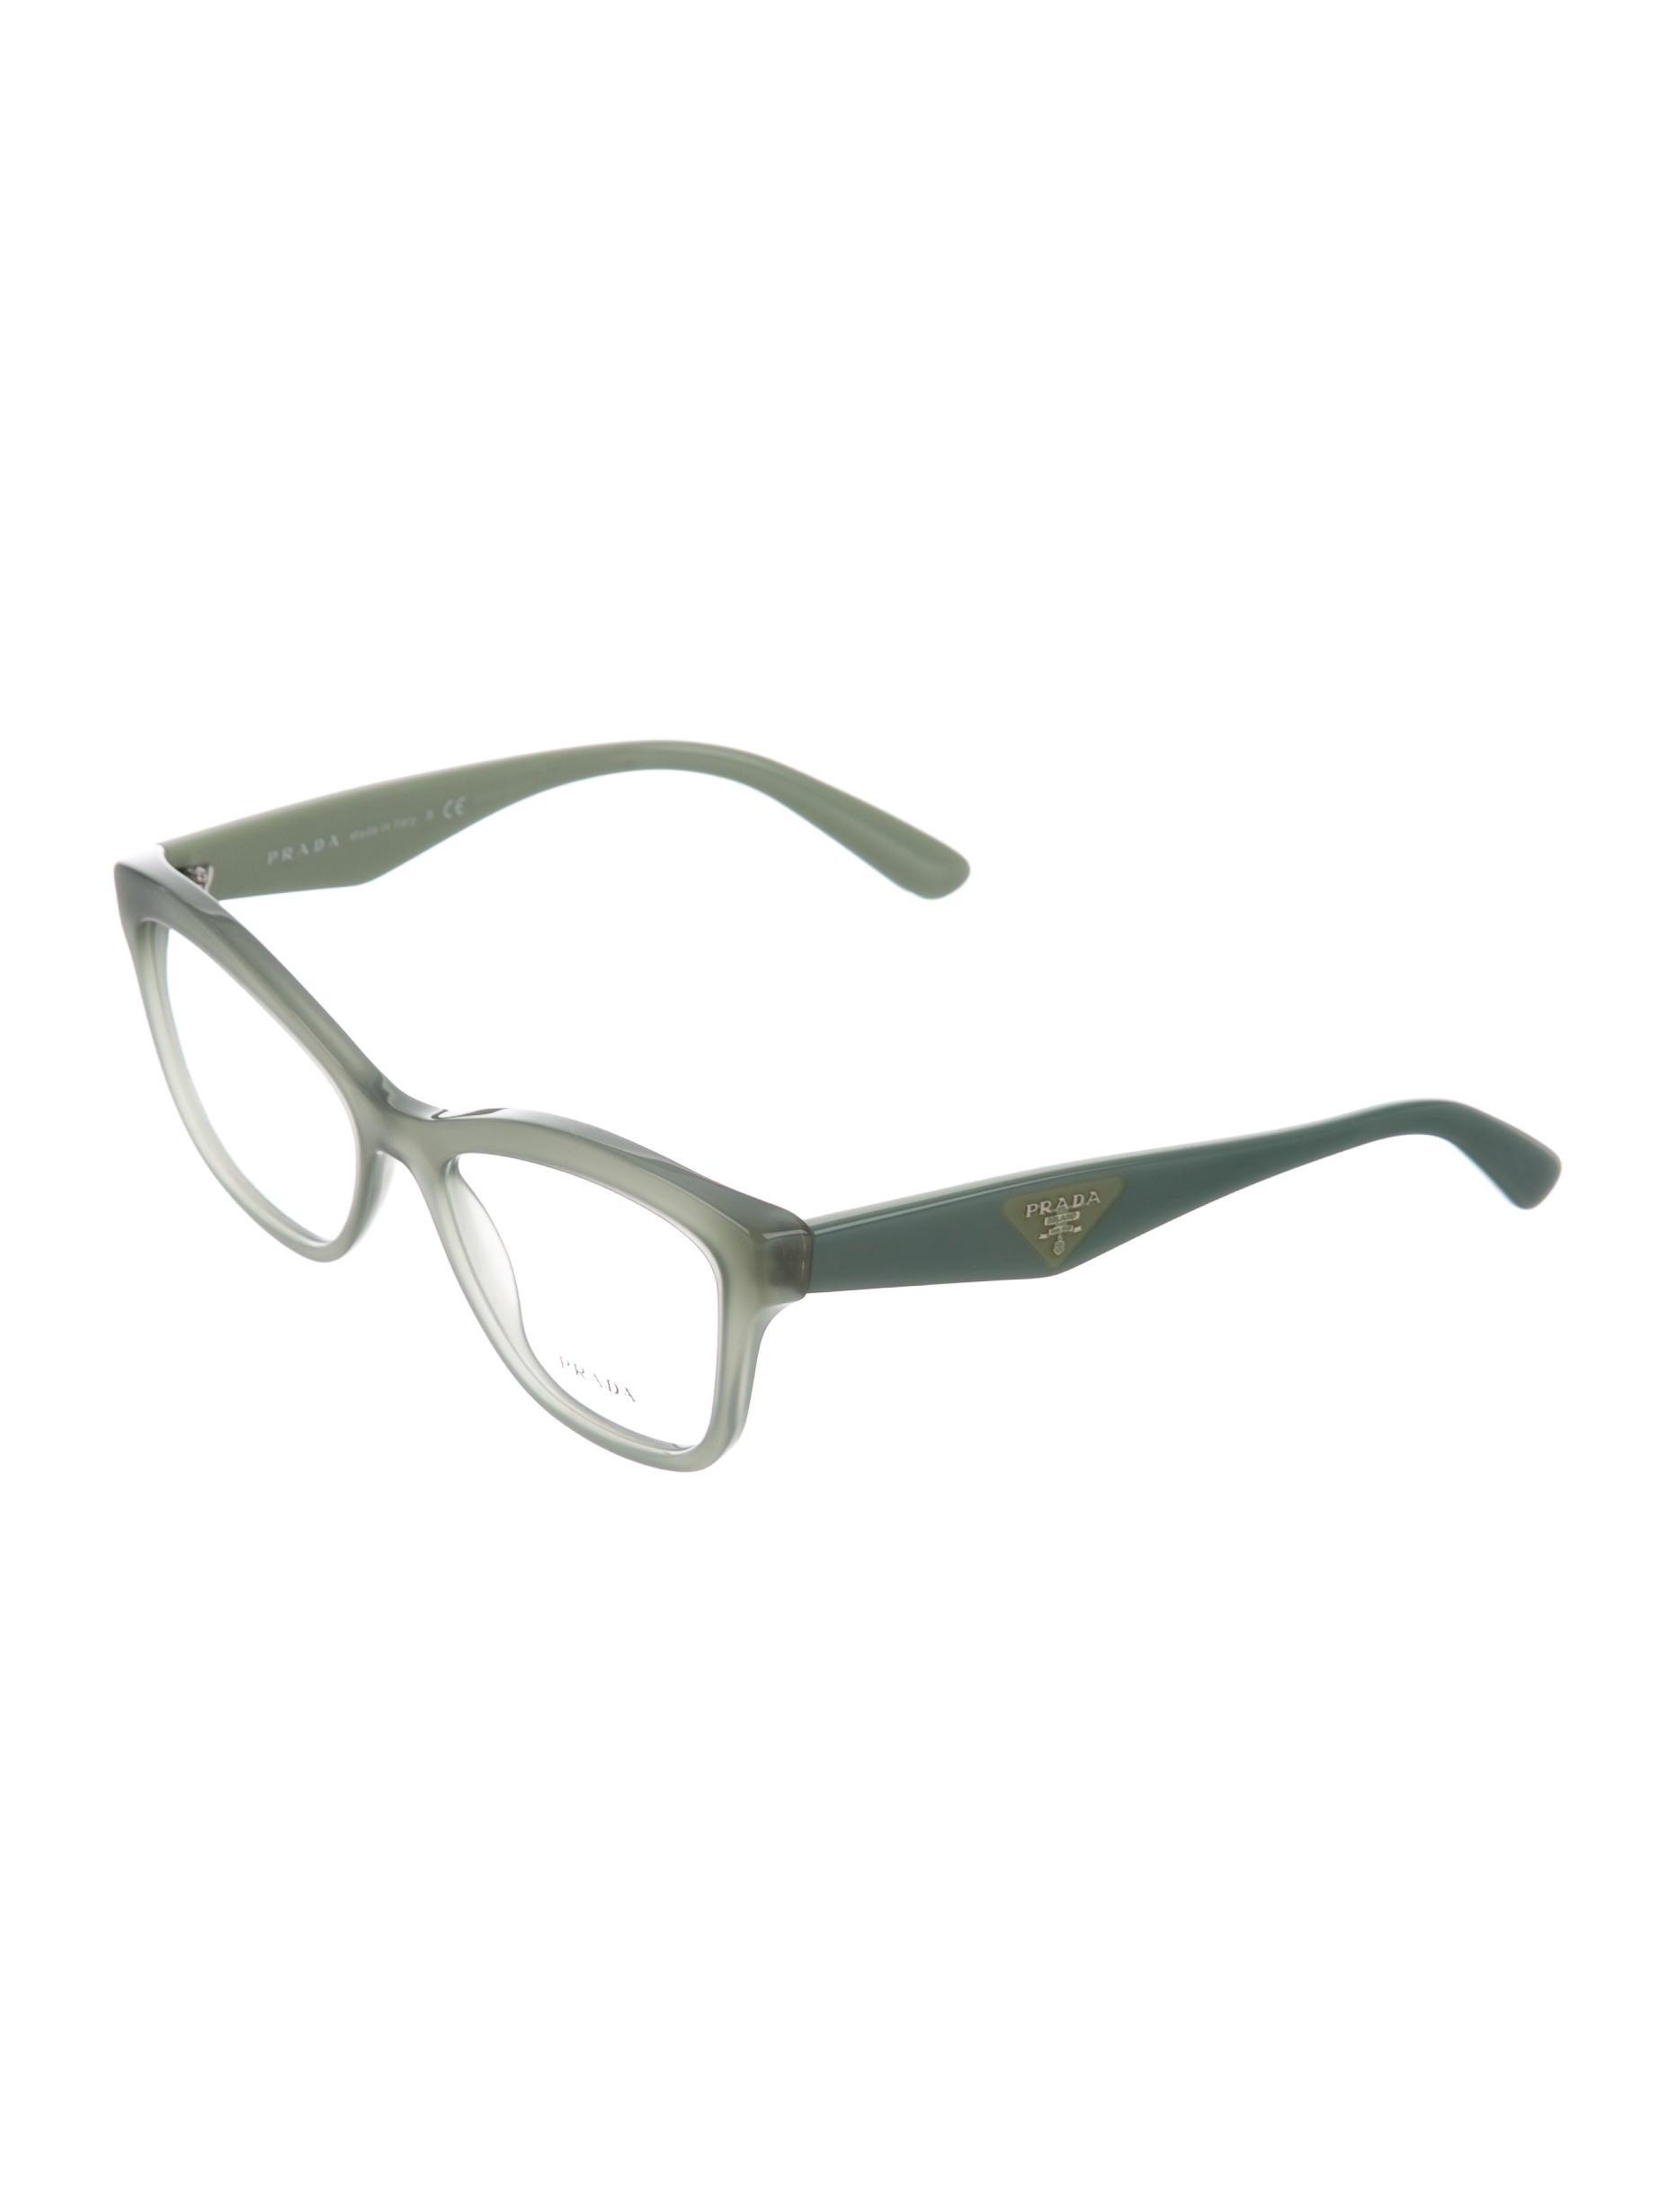 Prada Eyeglass Frames Cateye : Prada Cat-Eye Logo Eyeglasses w/ Tags - Accessories ...